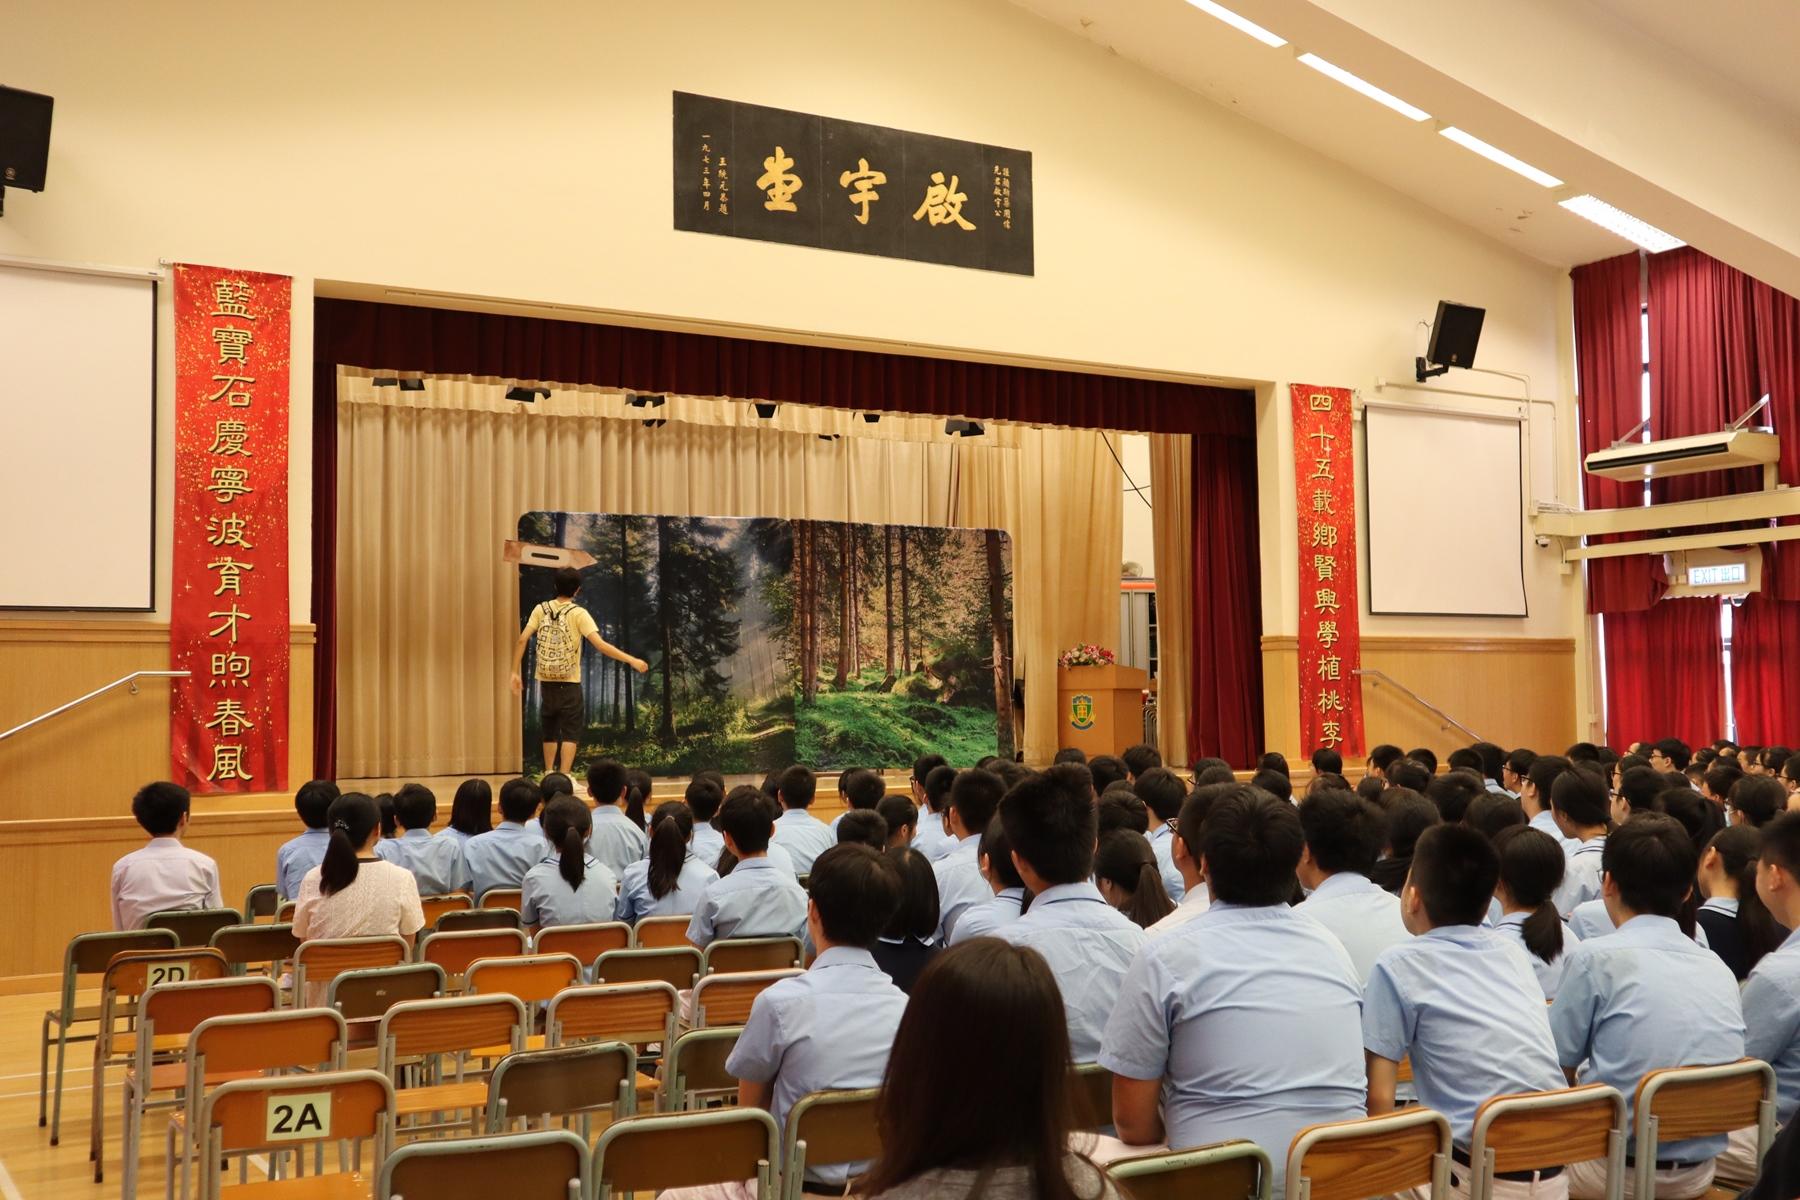 https://npc.edu.hk/sites/default/files/img_9158_5.jpg